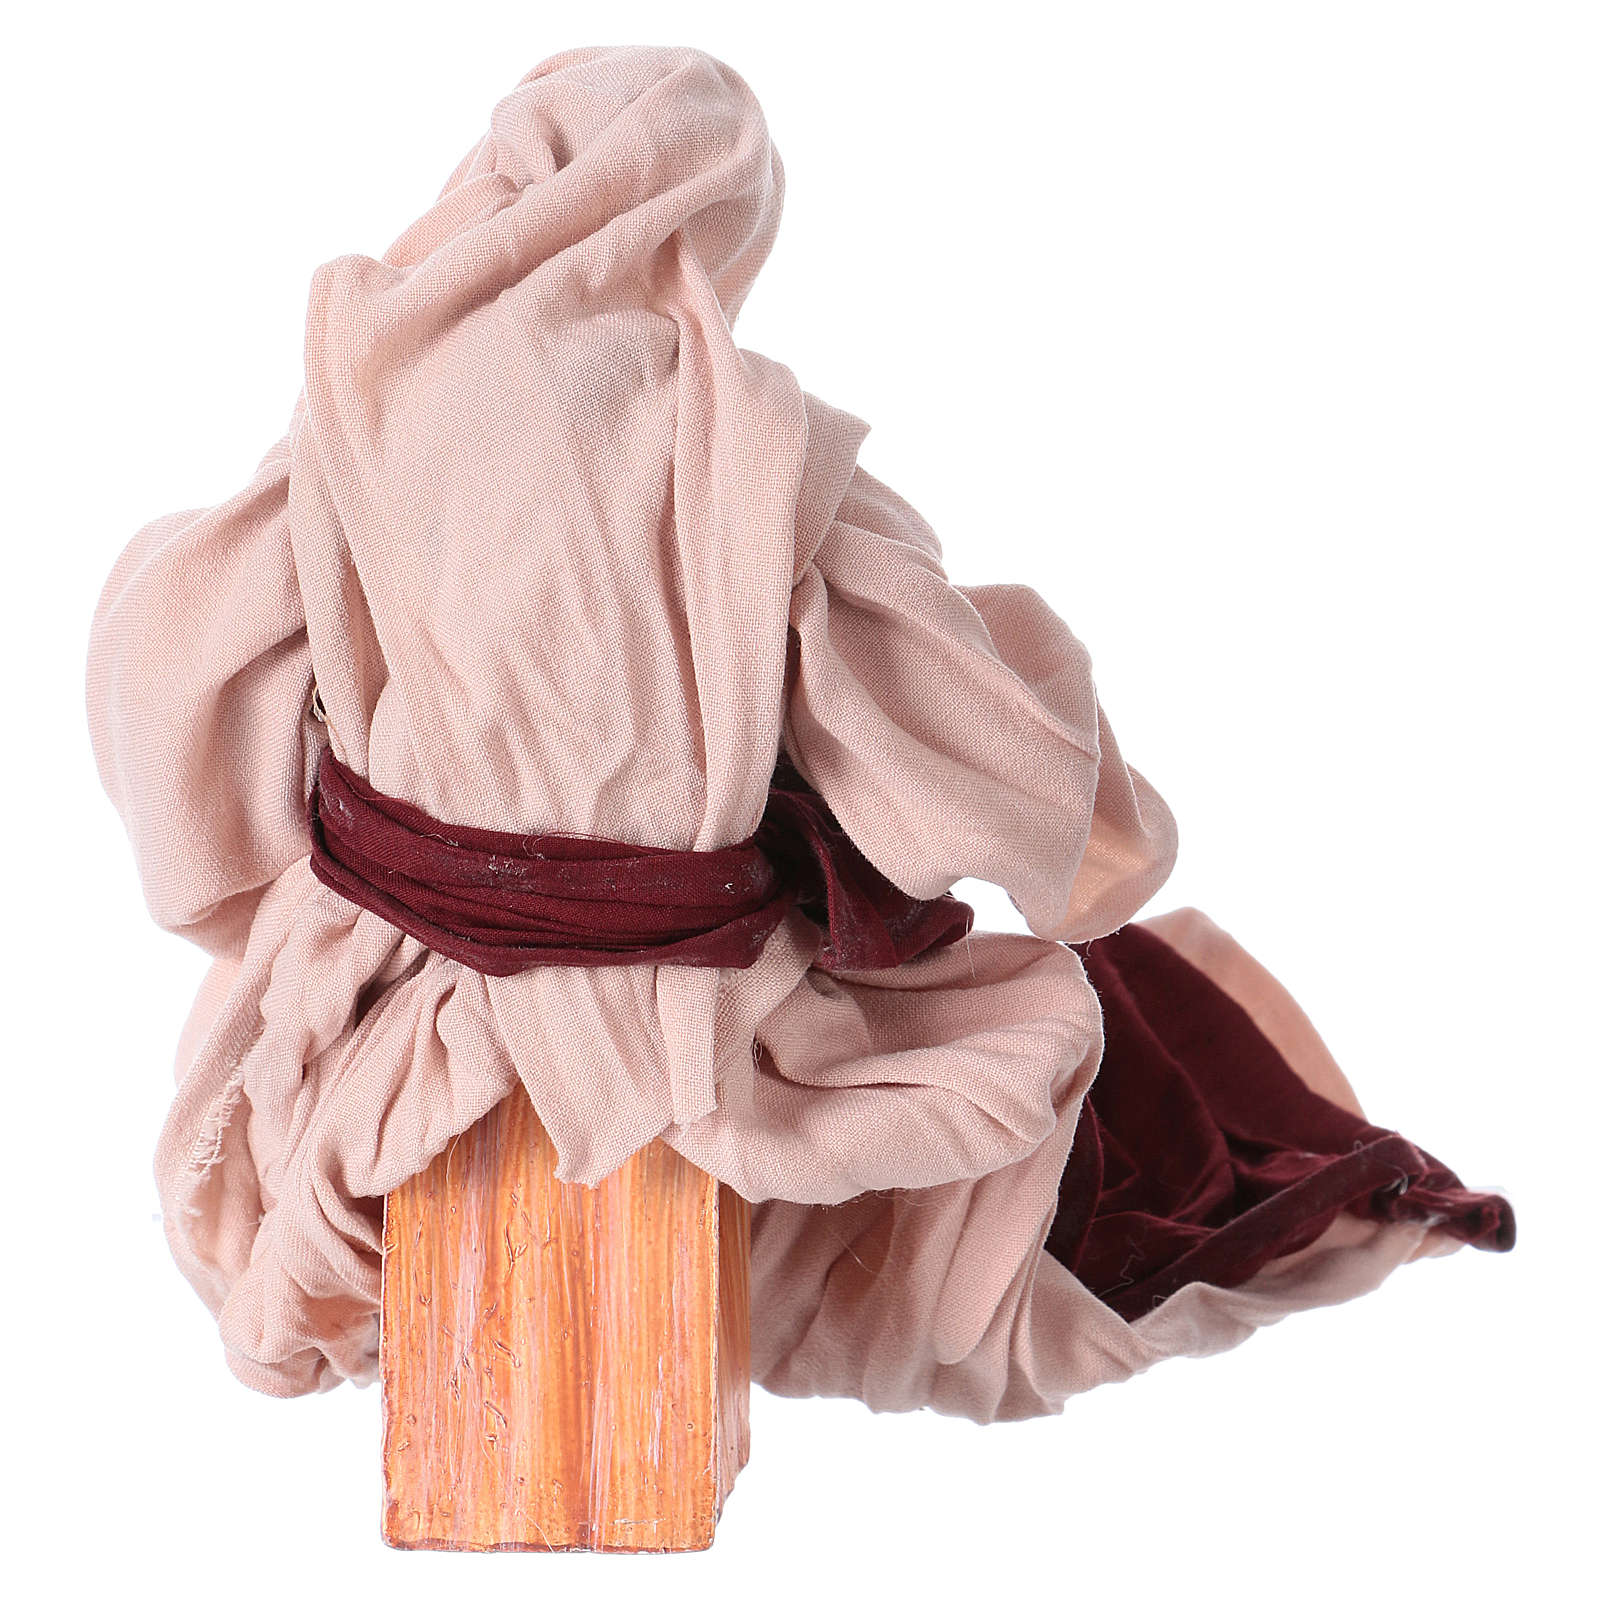 Natività 25 cm resina stoffa rosa bordeaux 3